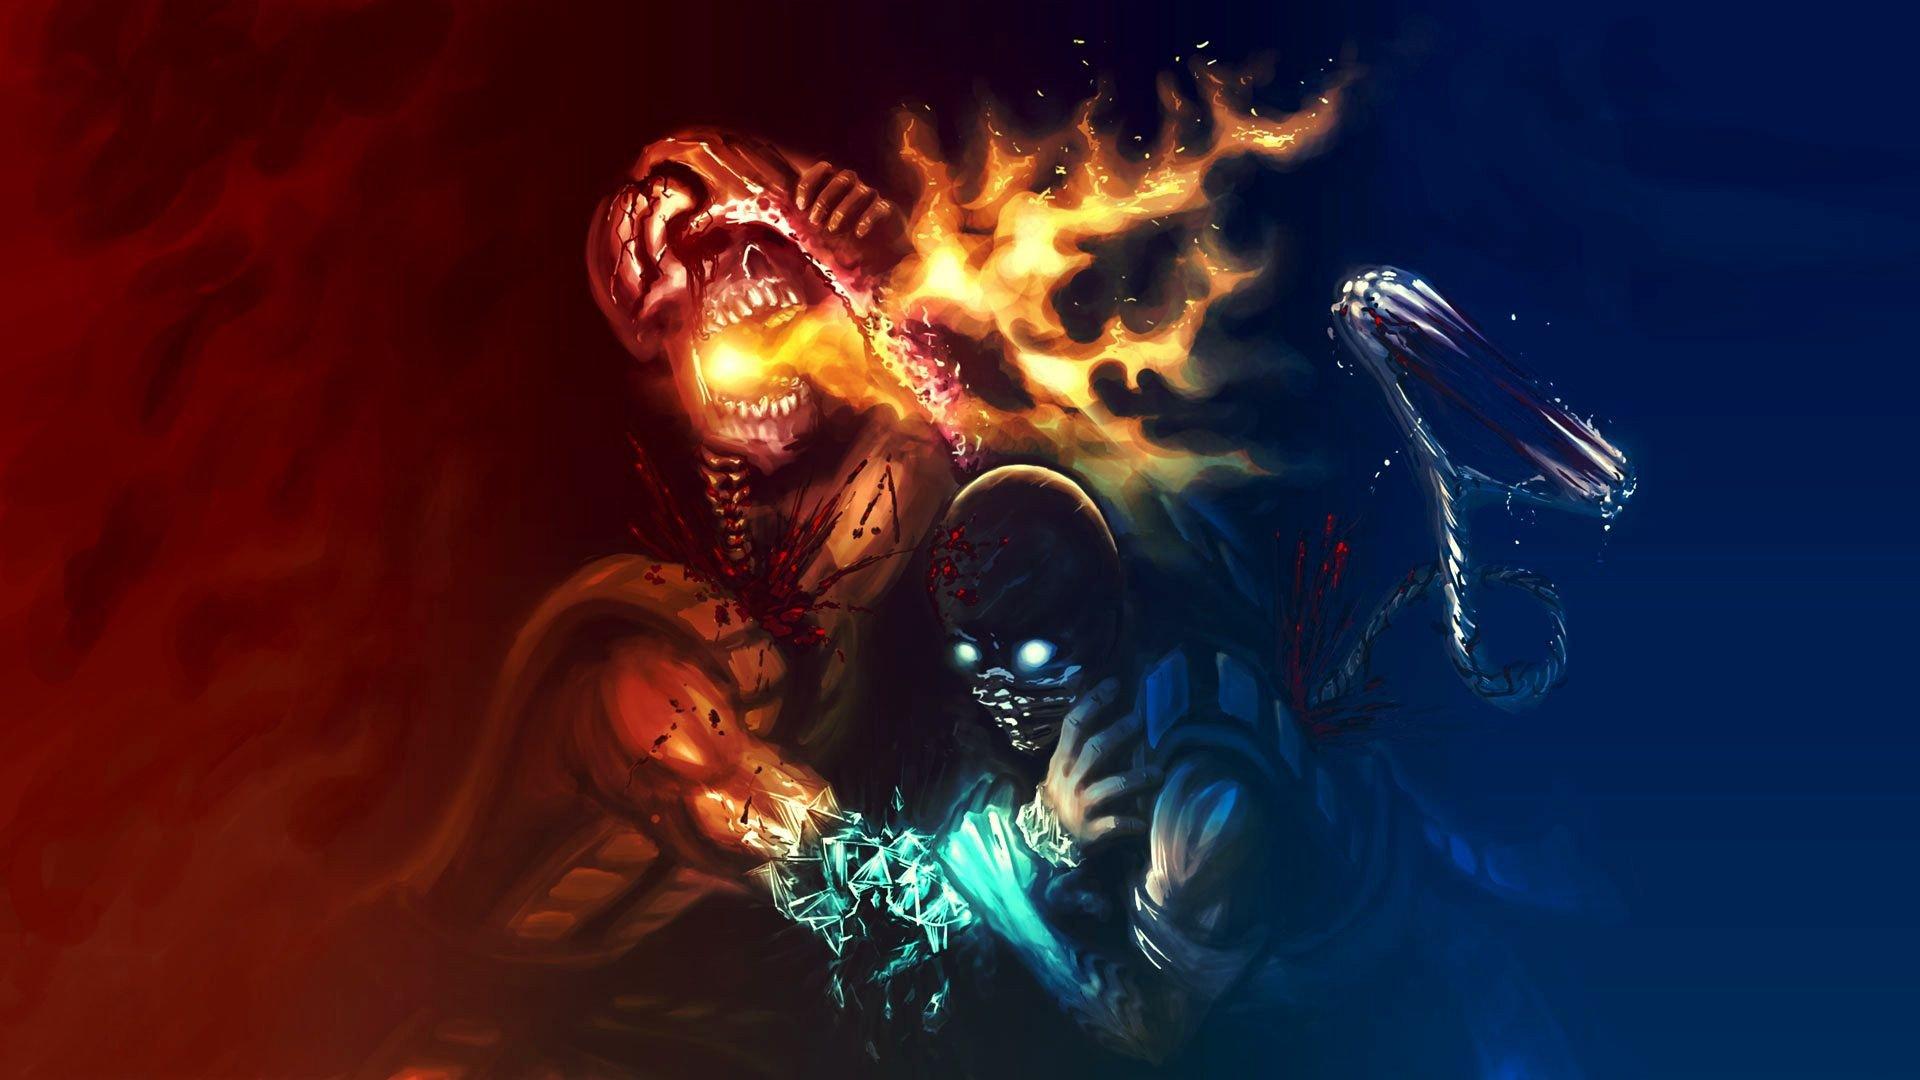 Mortal Kombat Full Hd Wallpaper And Background 1920x1080